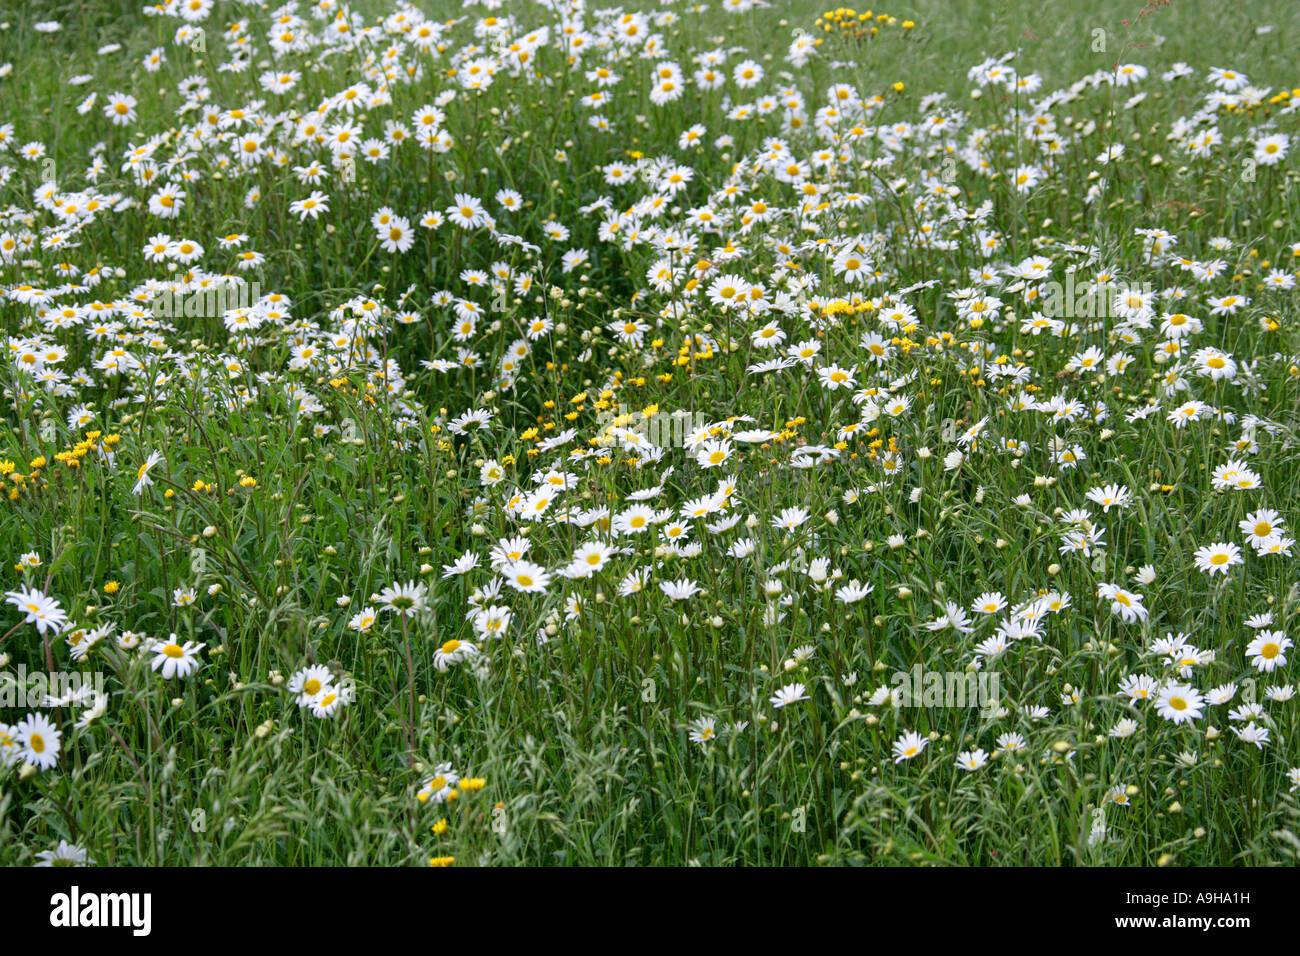 Ox Eye Daisies, Leucanthemum vulgare, and Nipplewort, Lapsana communis, in a Spring Meadow. Stock Photo